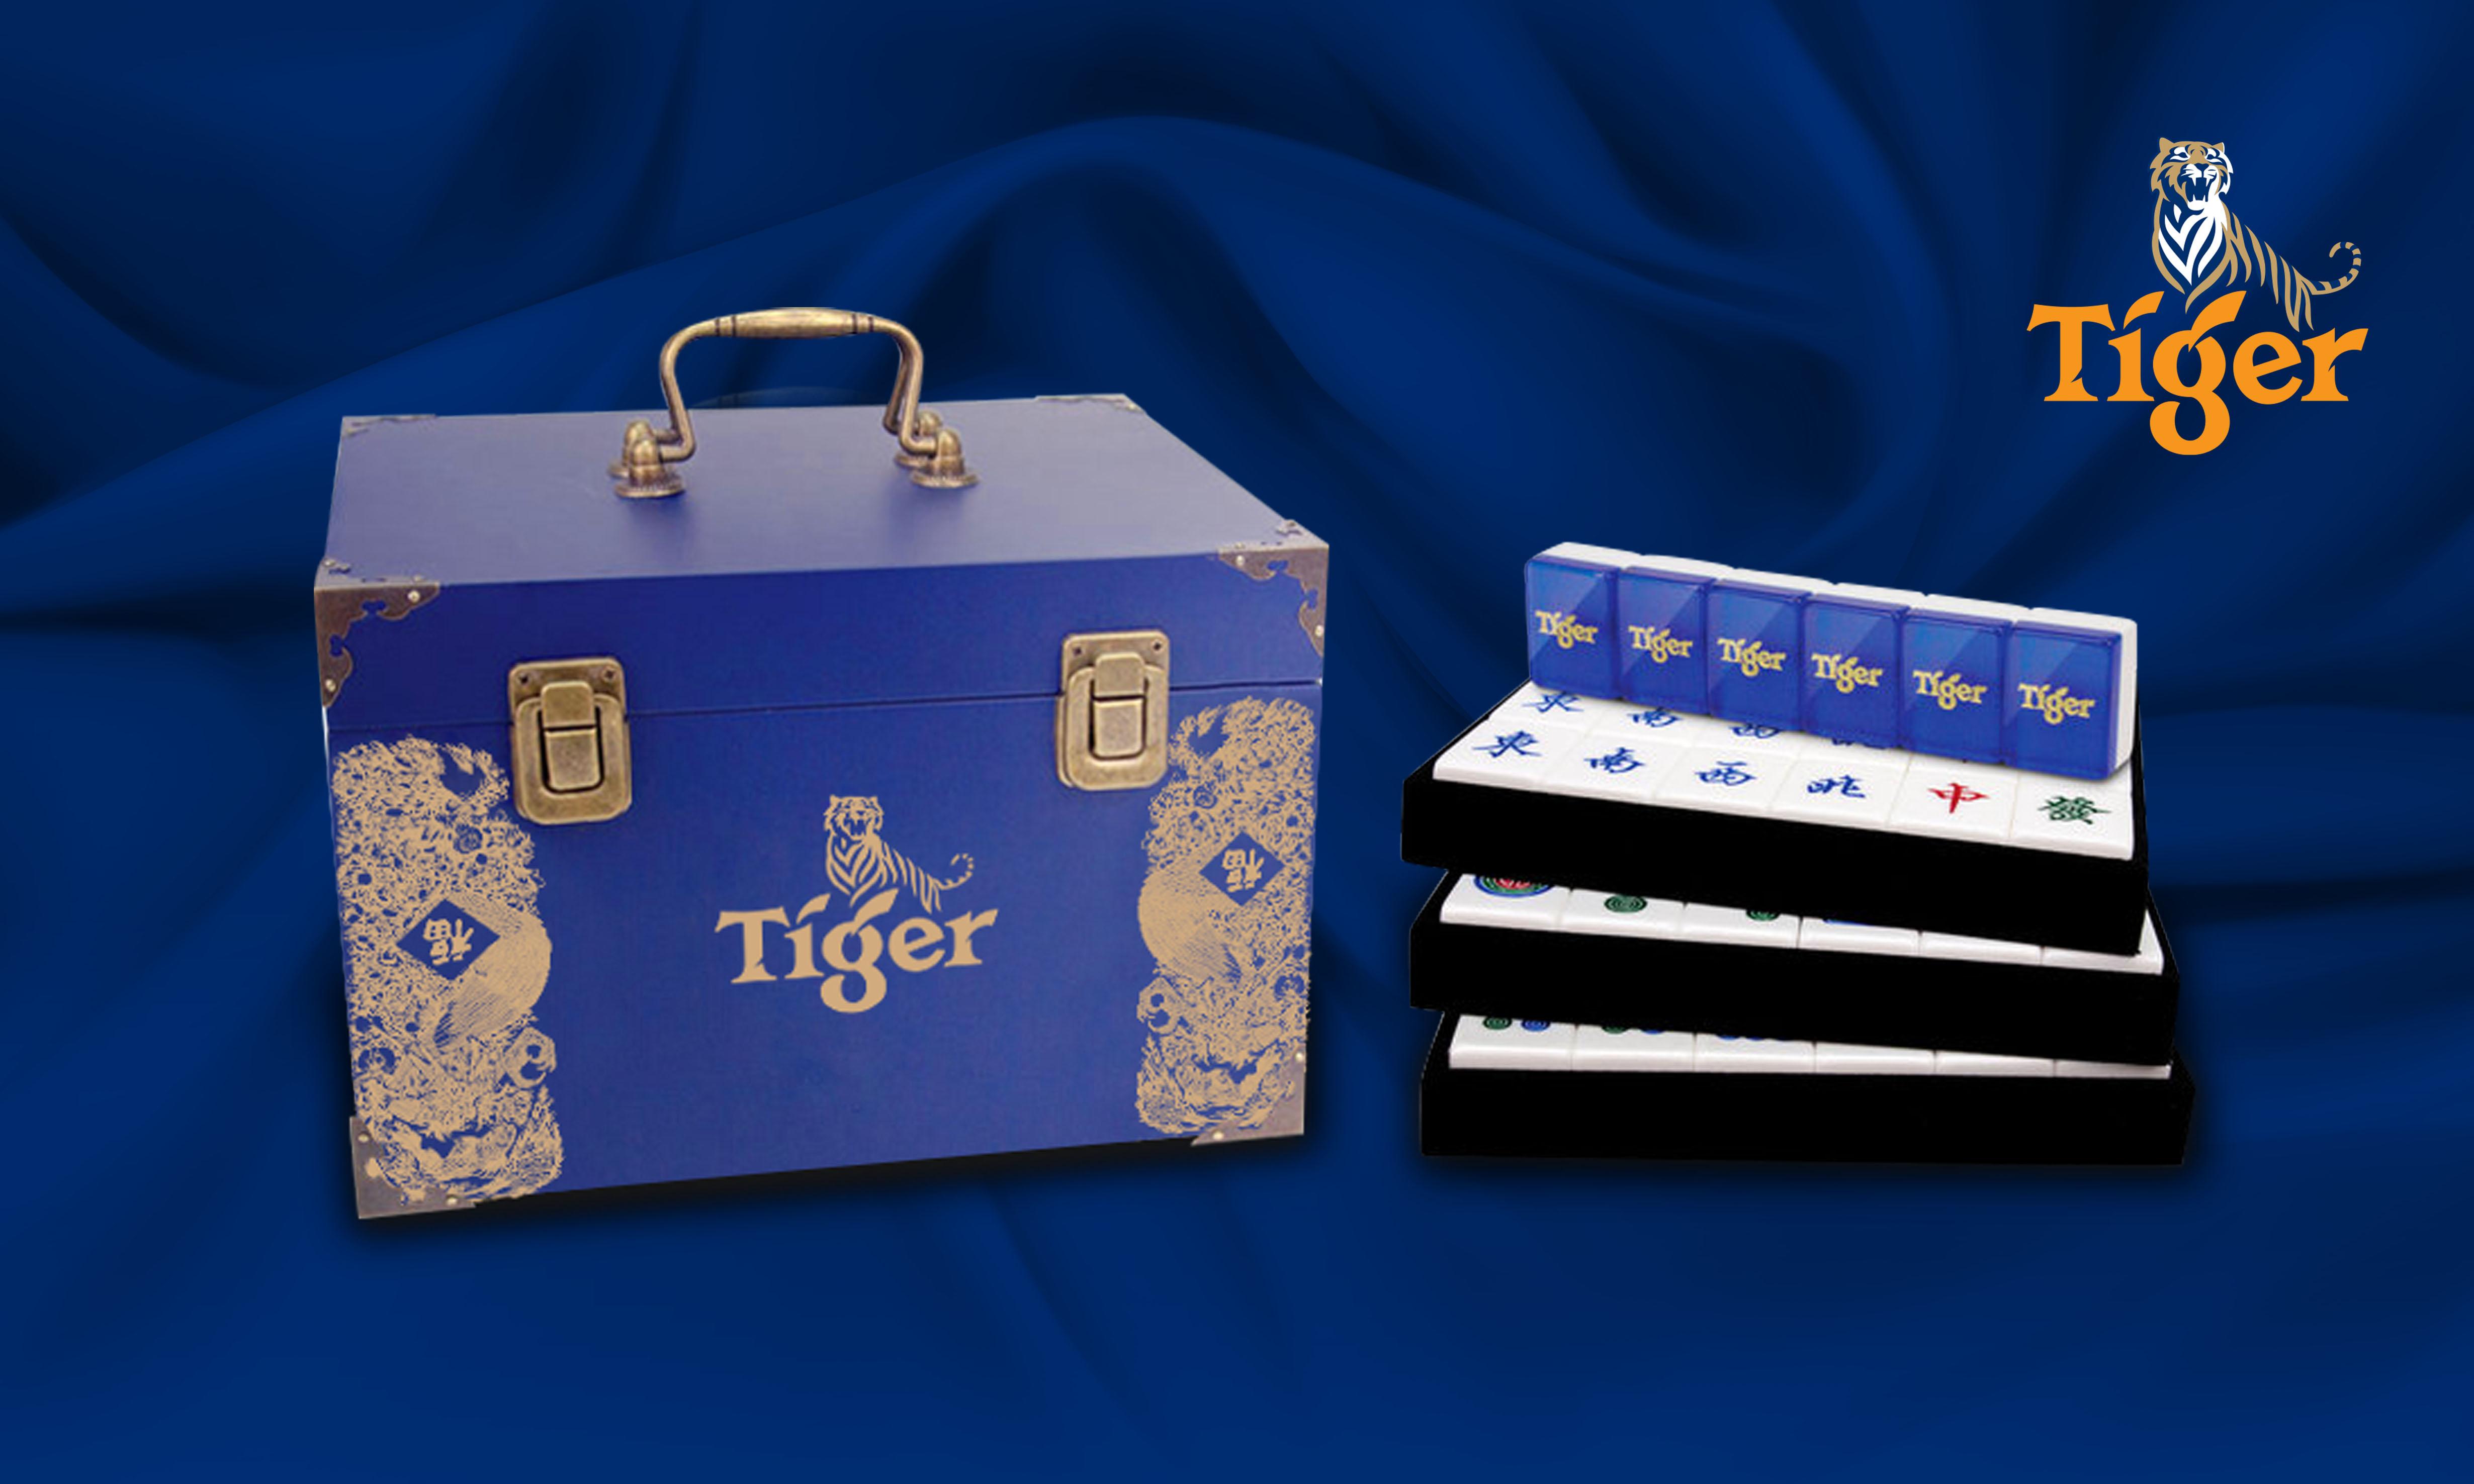 Tiger Mahjong Set